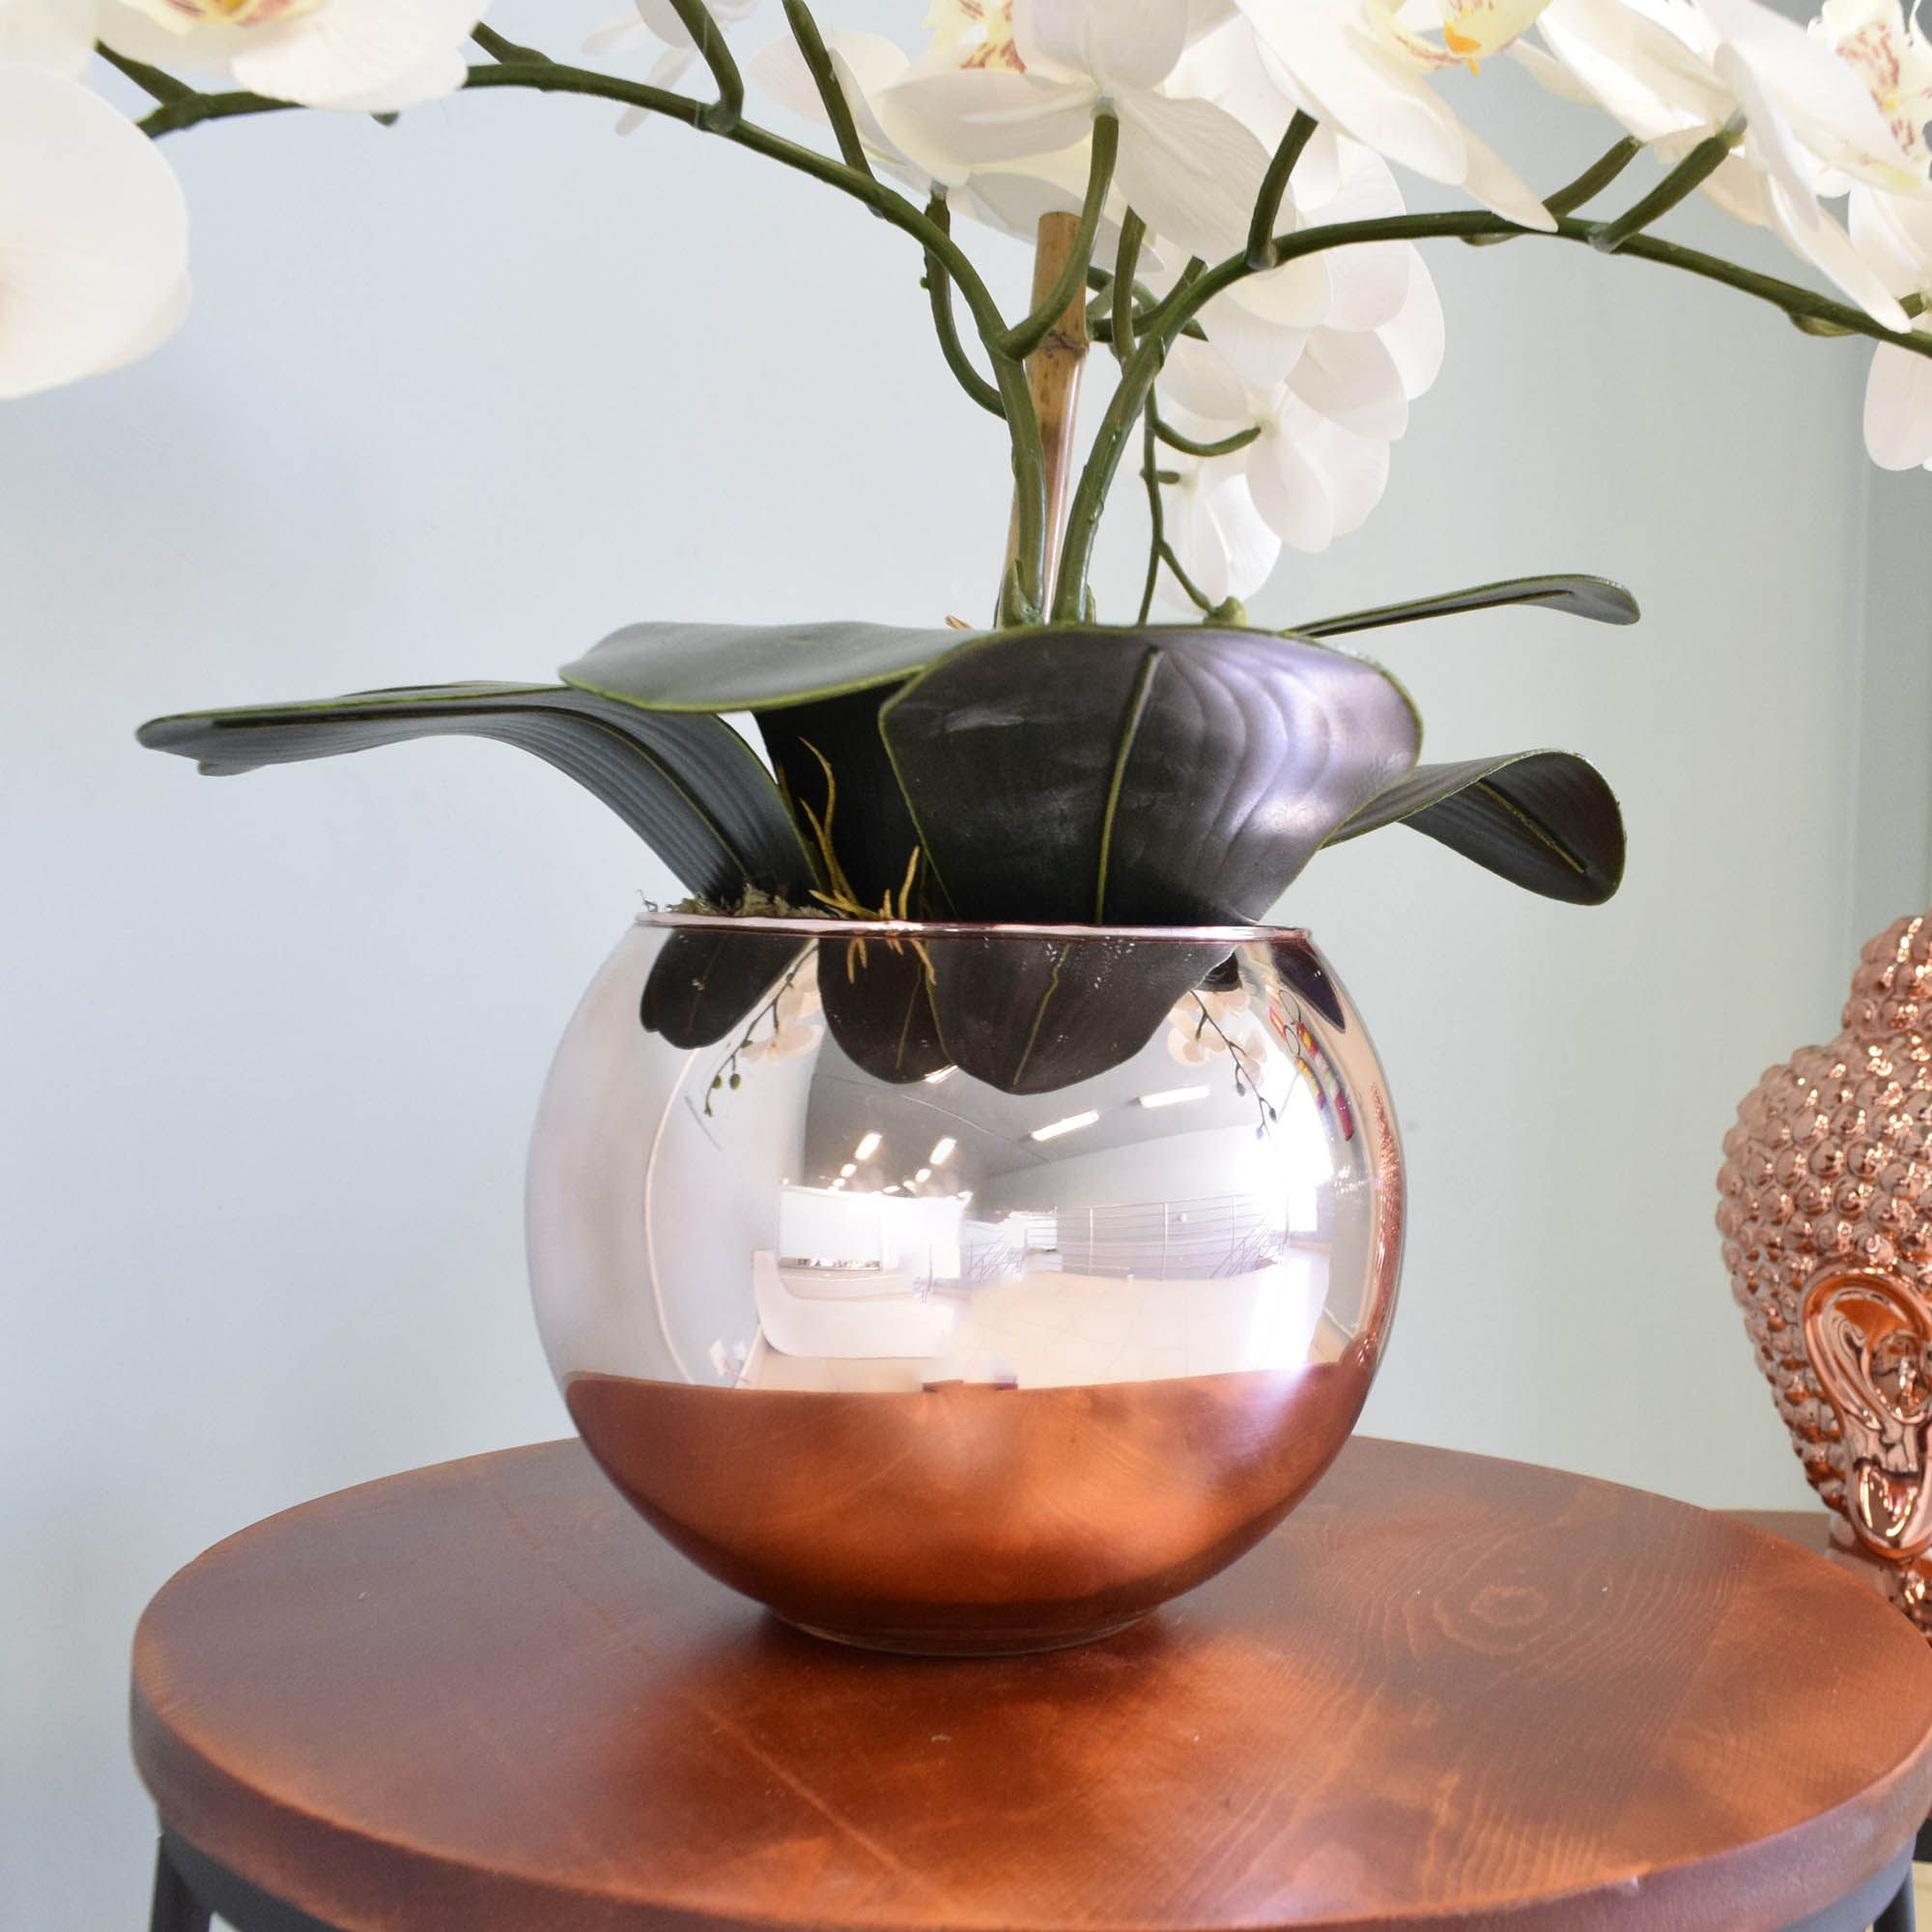 Flores artificiais Arranjo de Orquídeas Branco Artificial no Vaso Rose Gold|Linha permanente Formosinha